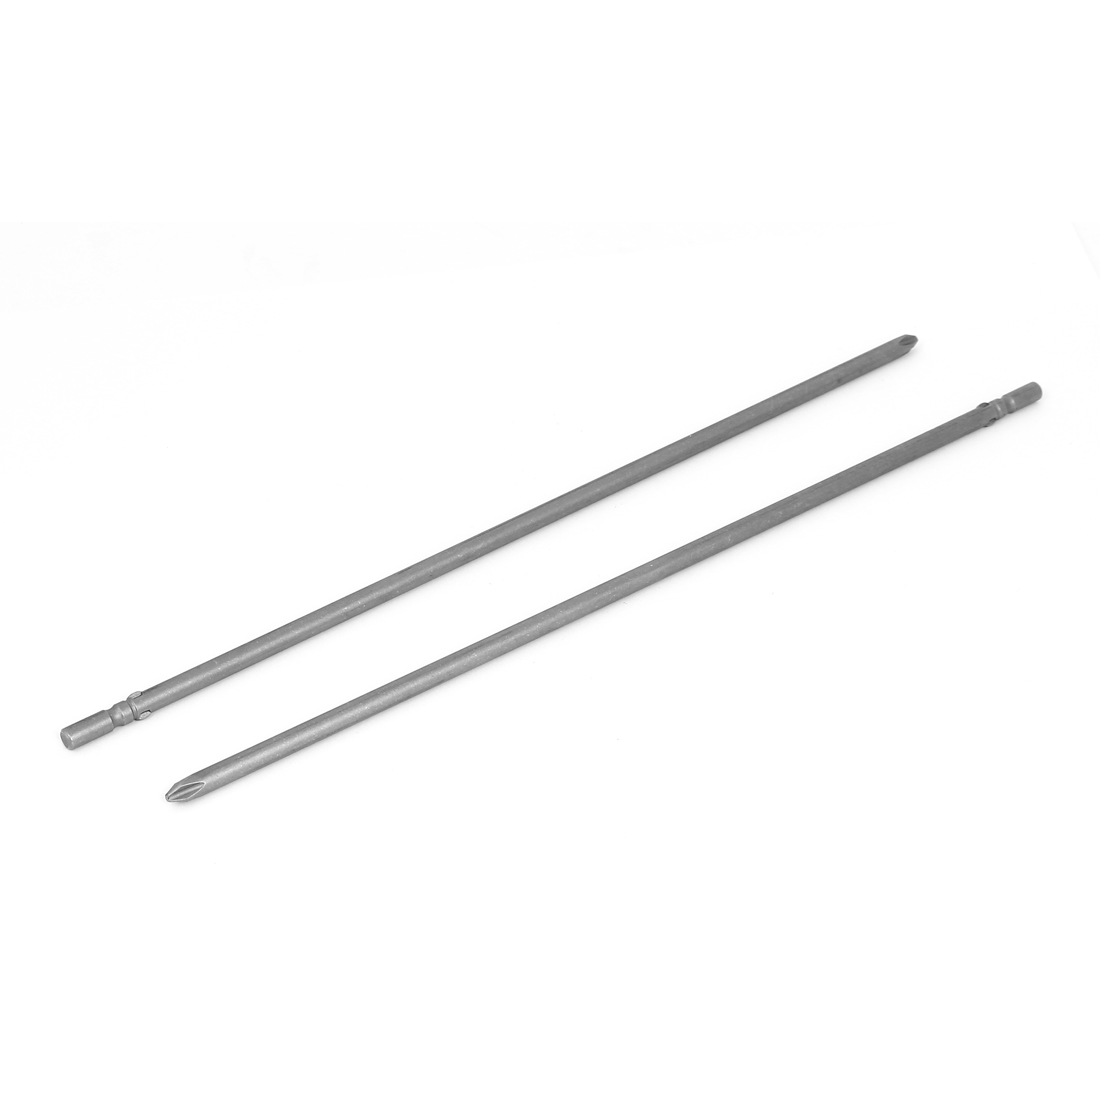 Magnetic PH2 6mm Phillips Cross Head Screwdriver Bit Tool 300mm Length 2pcs